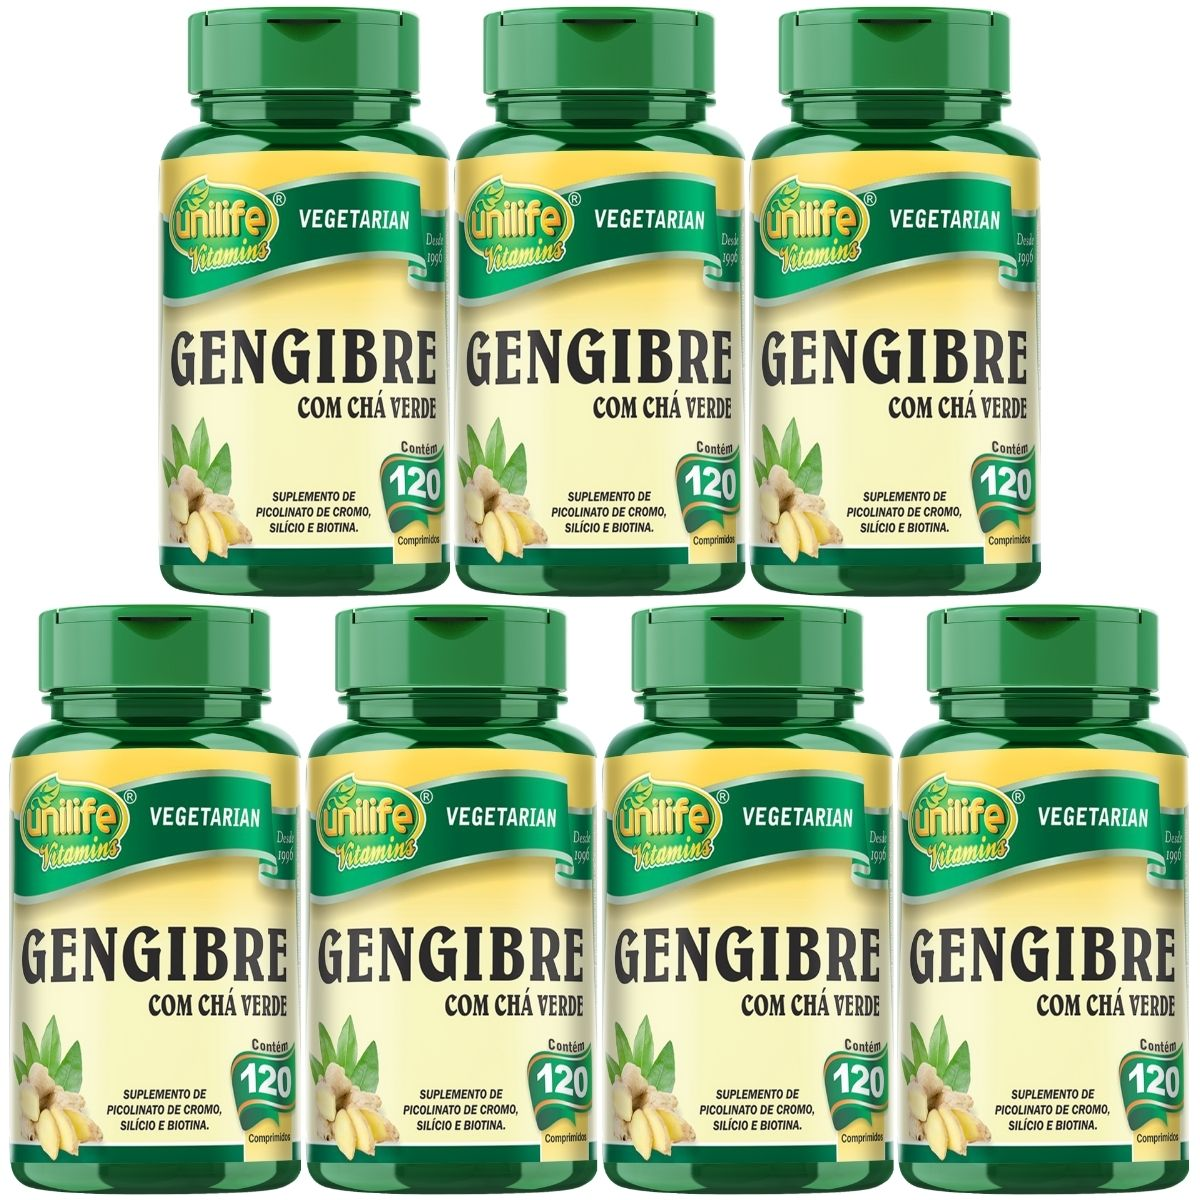 Kit 7 Gengibre C/ Chá Verde Unilife - 400mg 120 Comprimidos